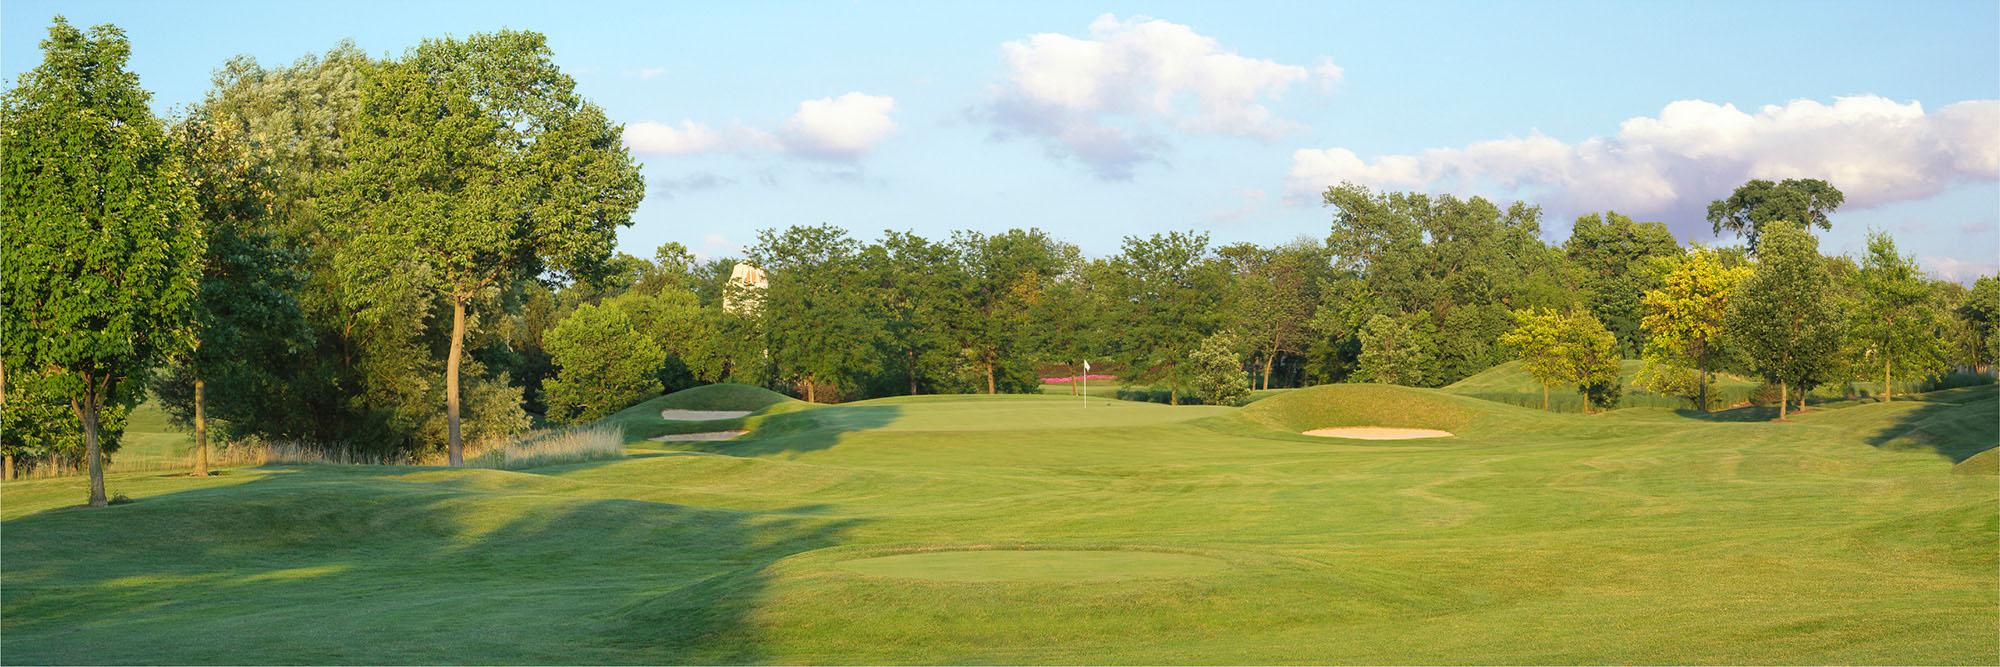 Golf Course Image - Heritage Club No. 15